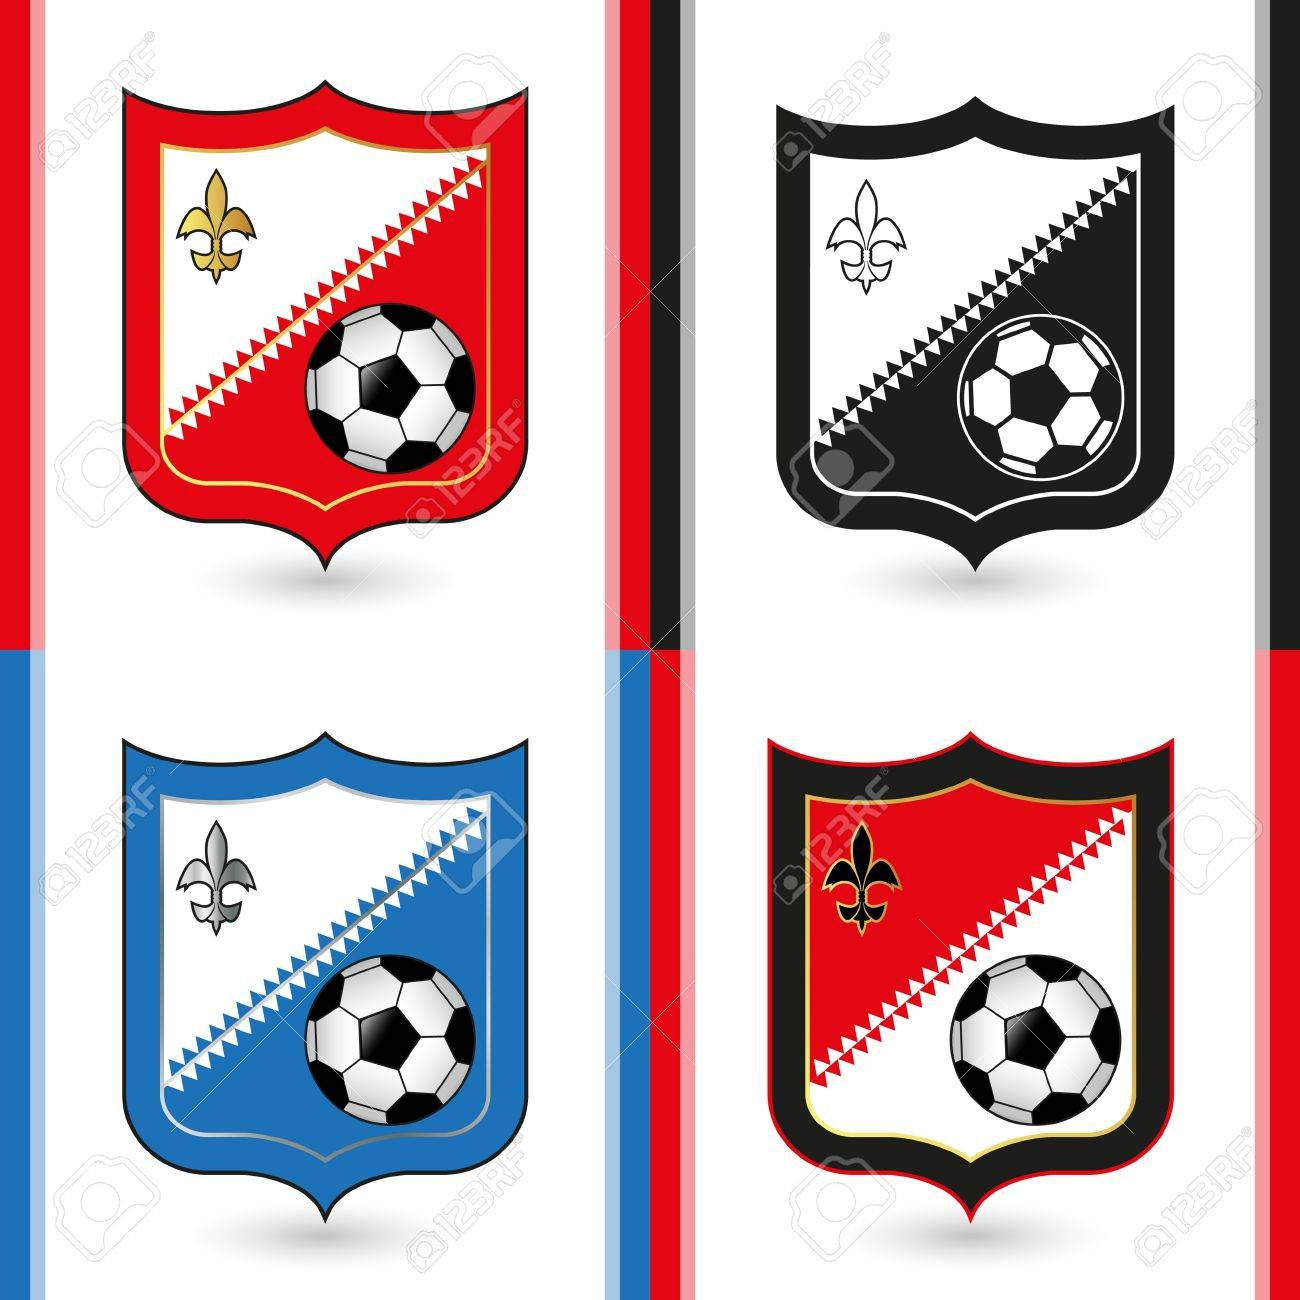 Soccer Emblems Stock Vector - 18473805